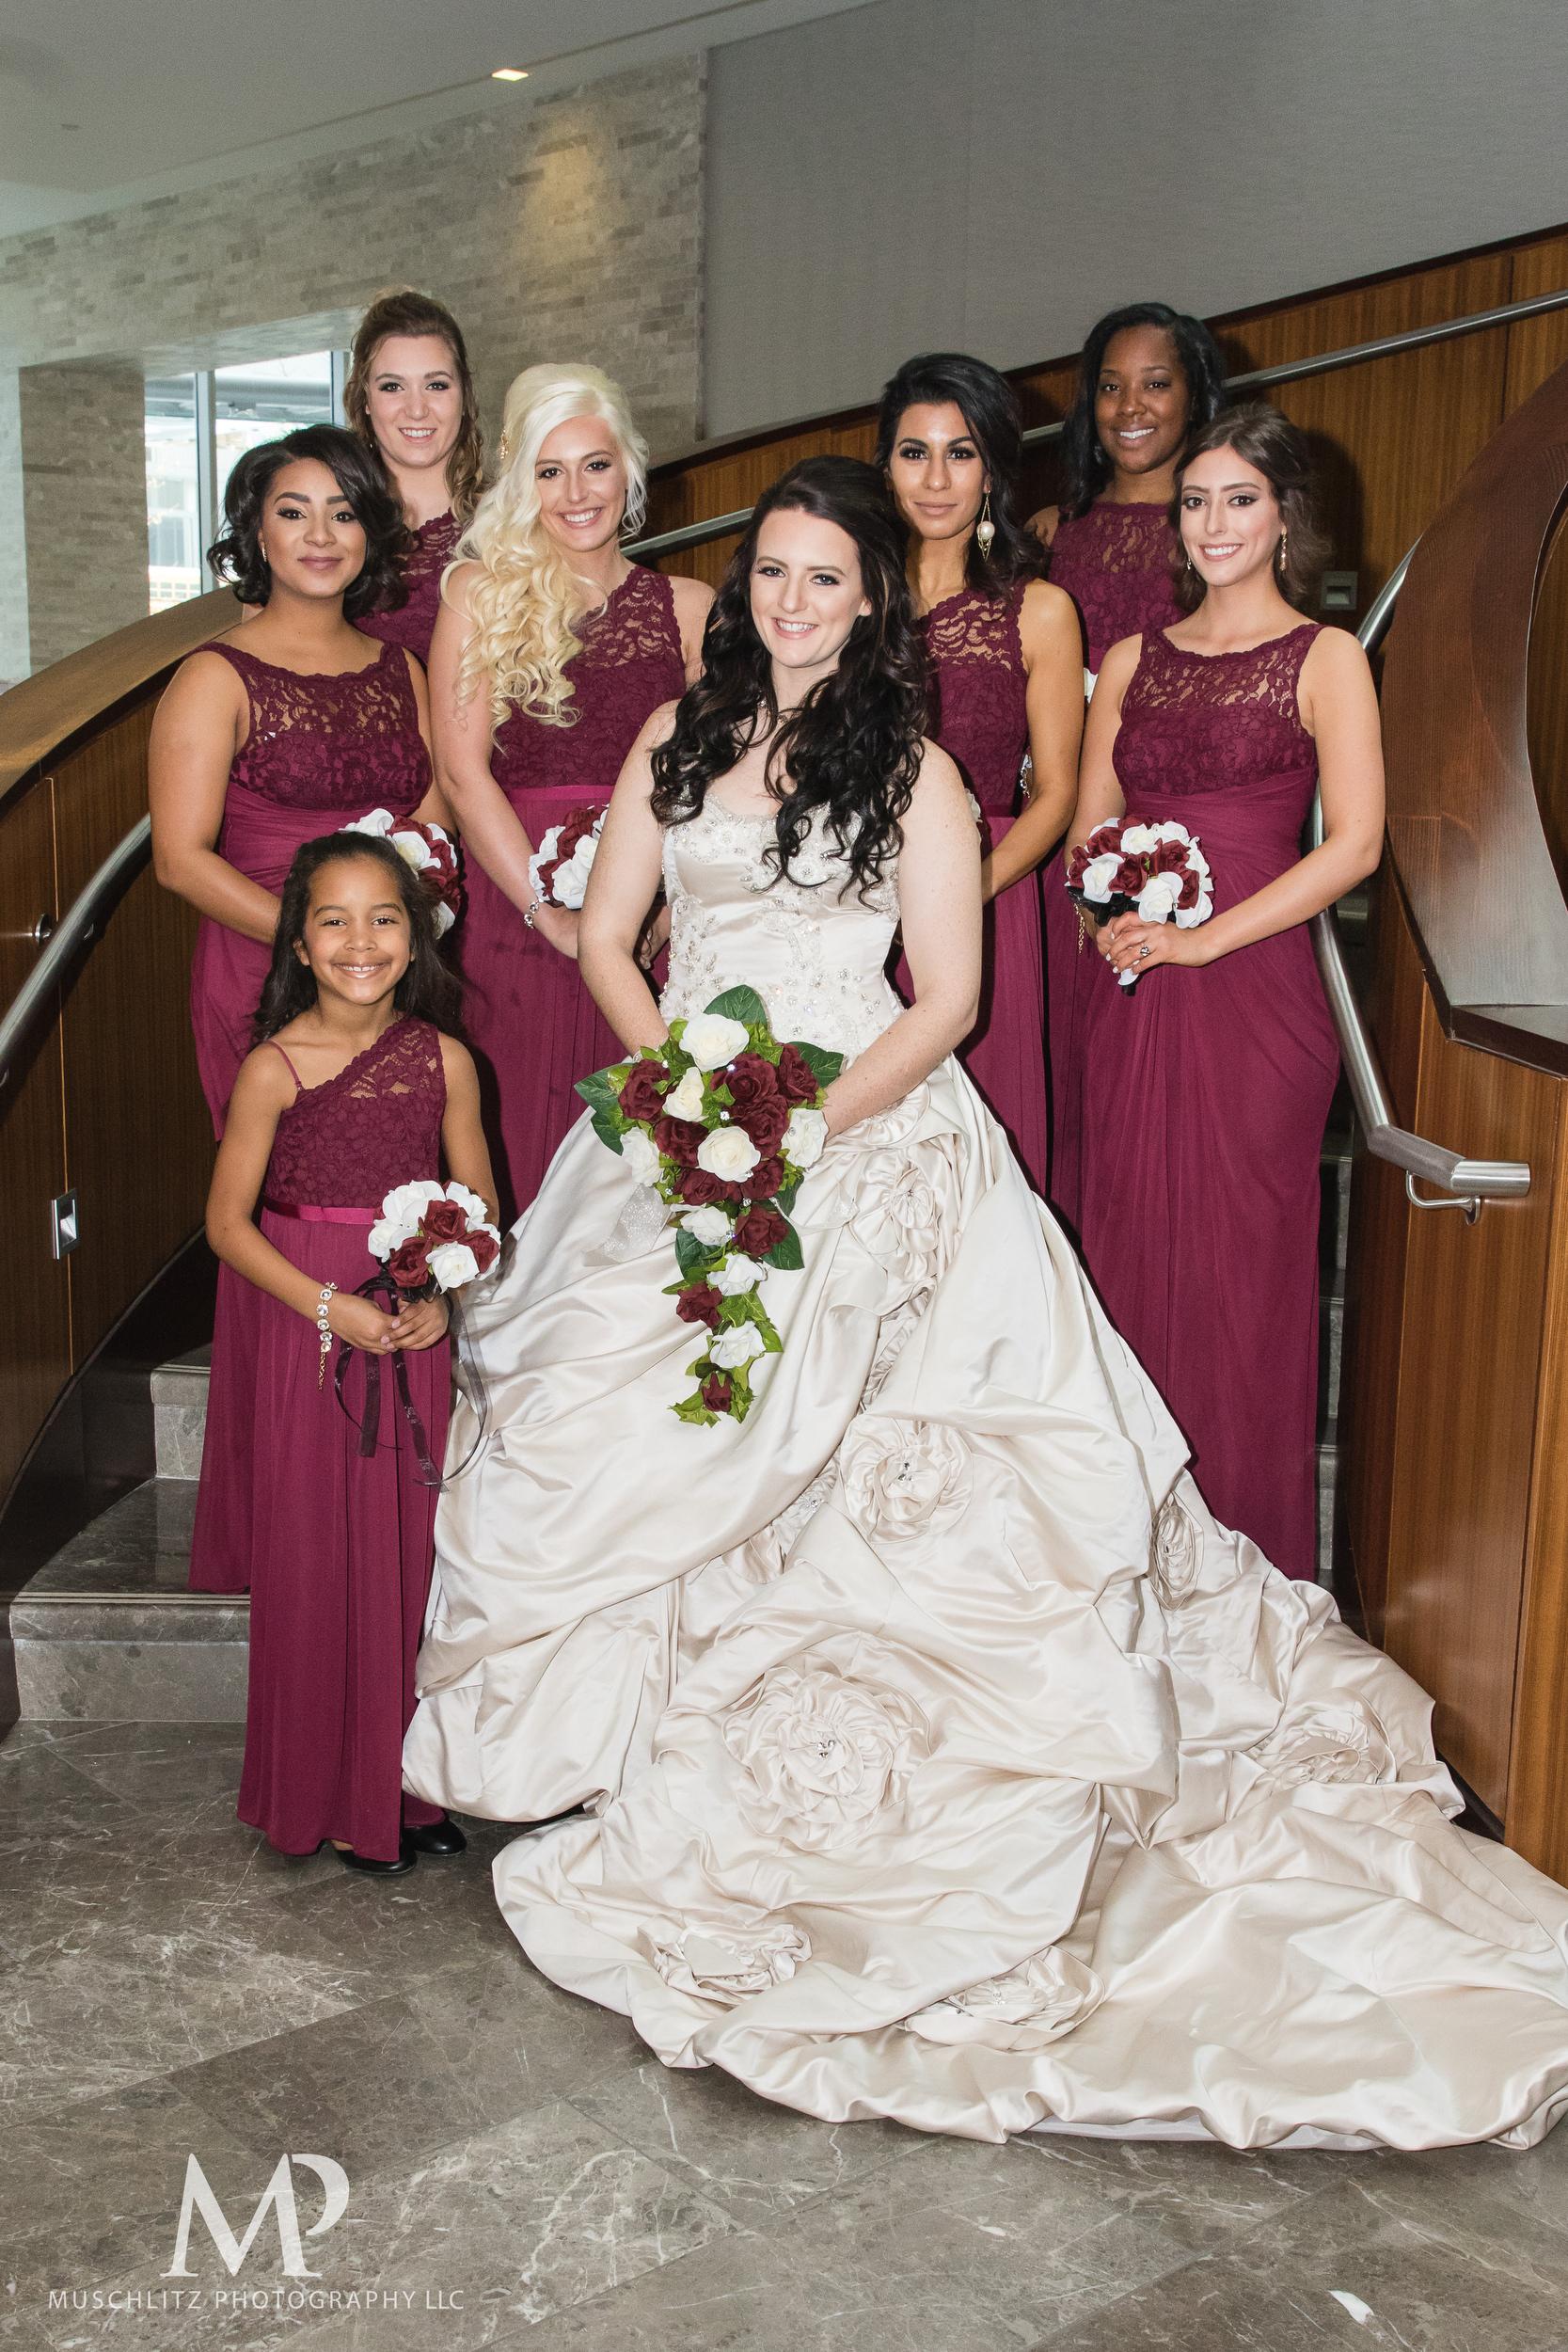 greater-columbus-convention-center-winter-wedding-ceremony-reception-portraits-columbus-ohio-muschlitz-photography-036.JPG